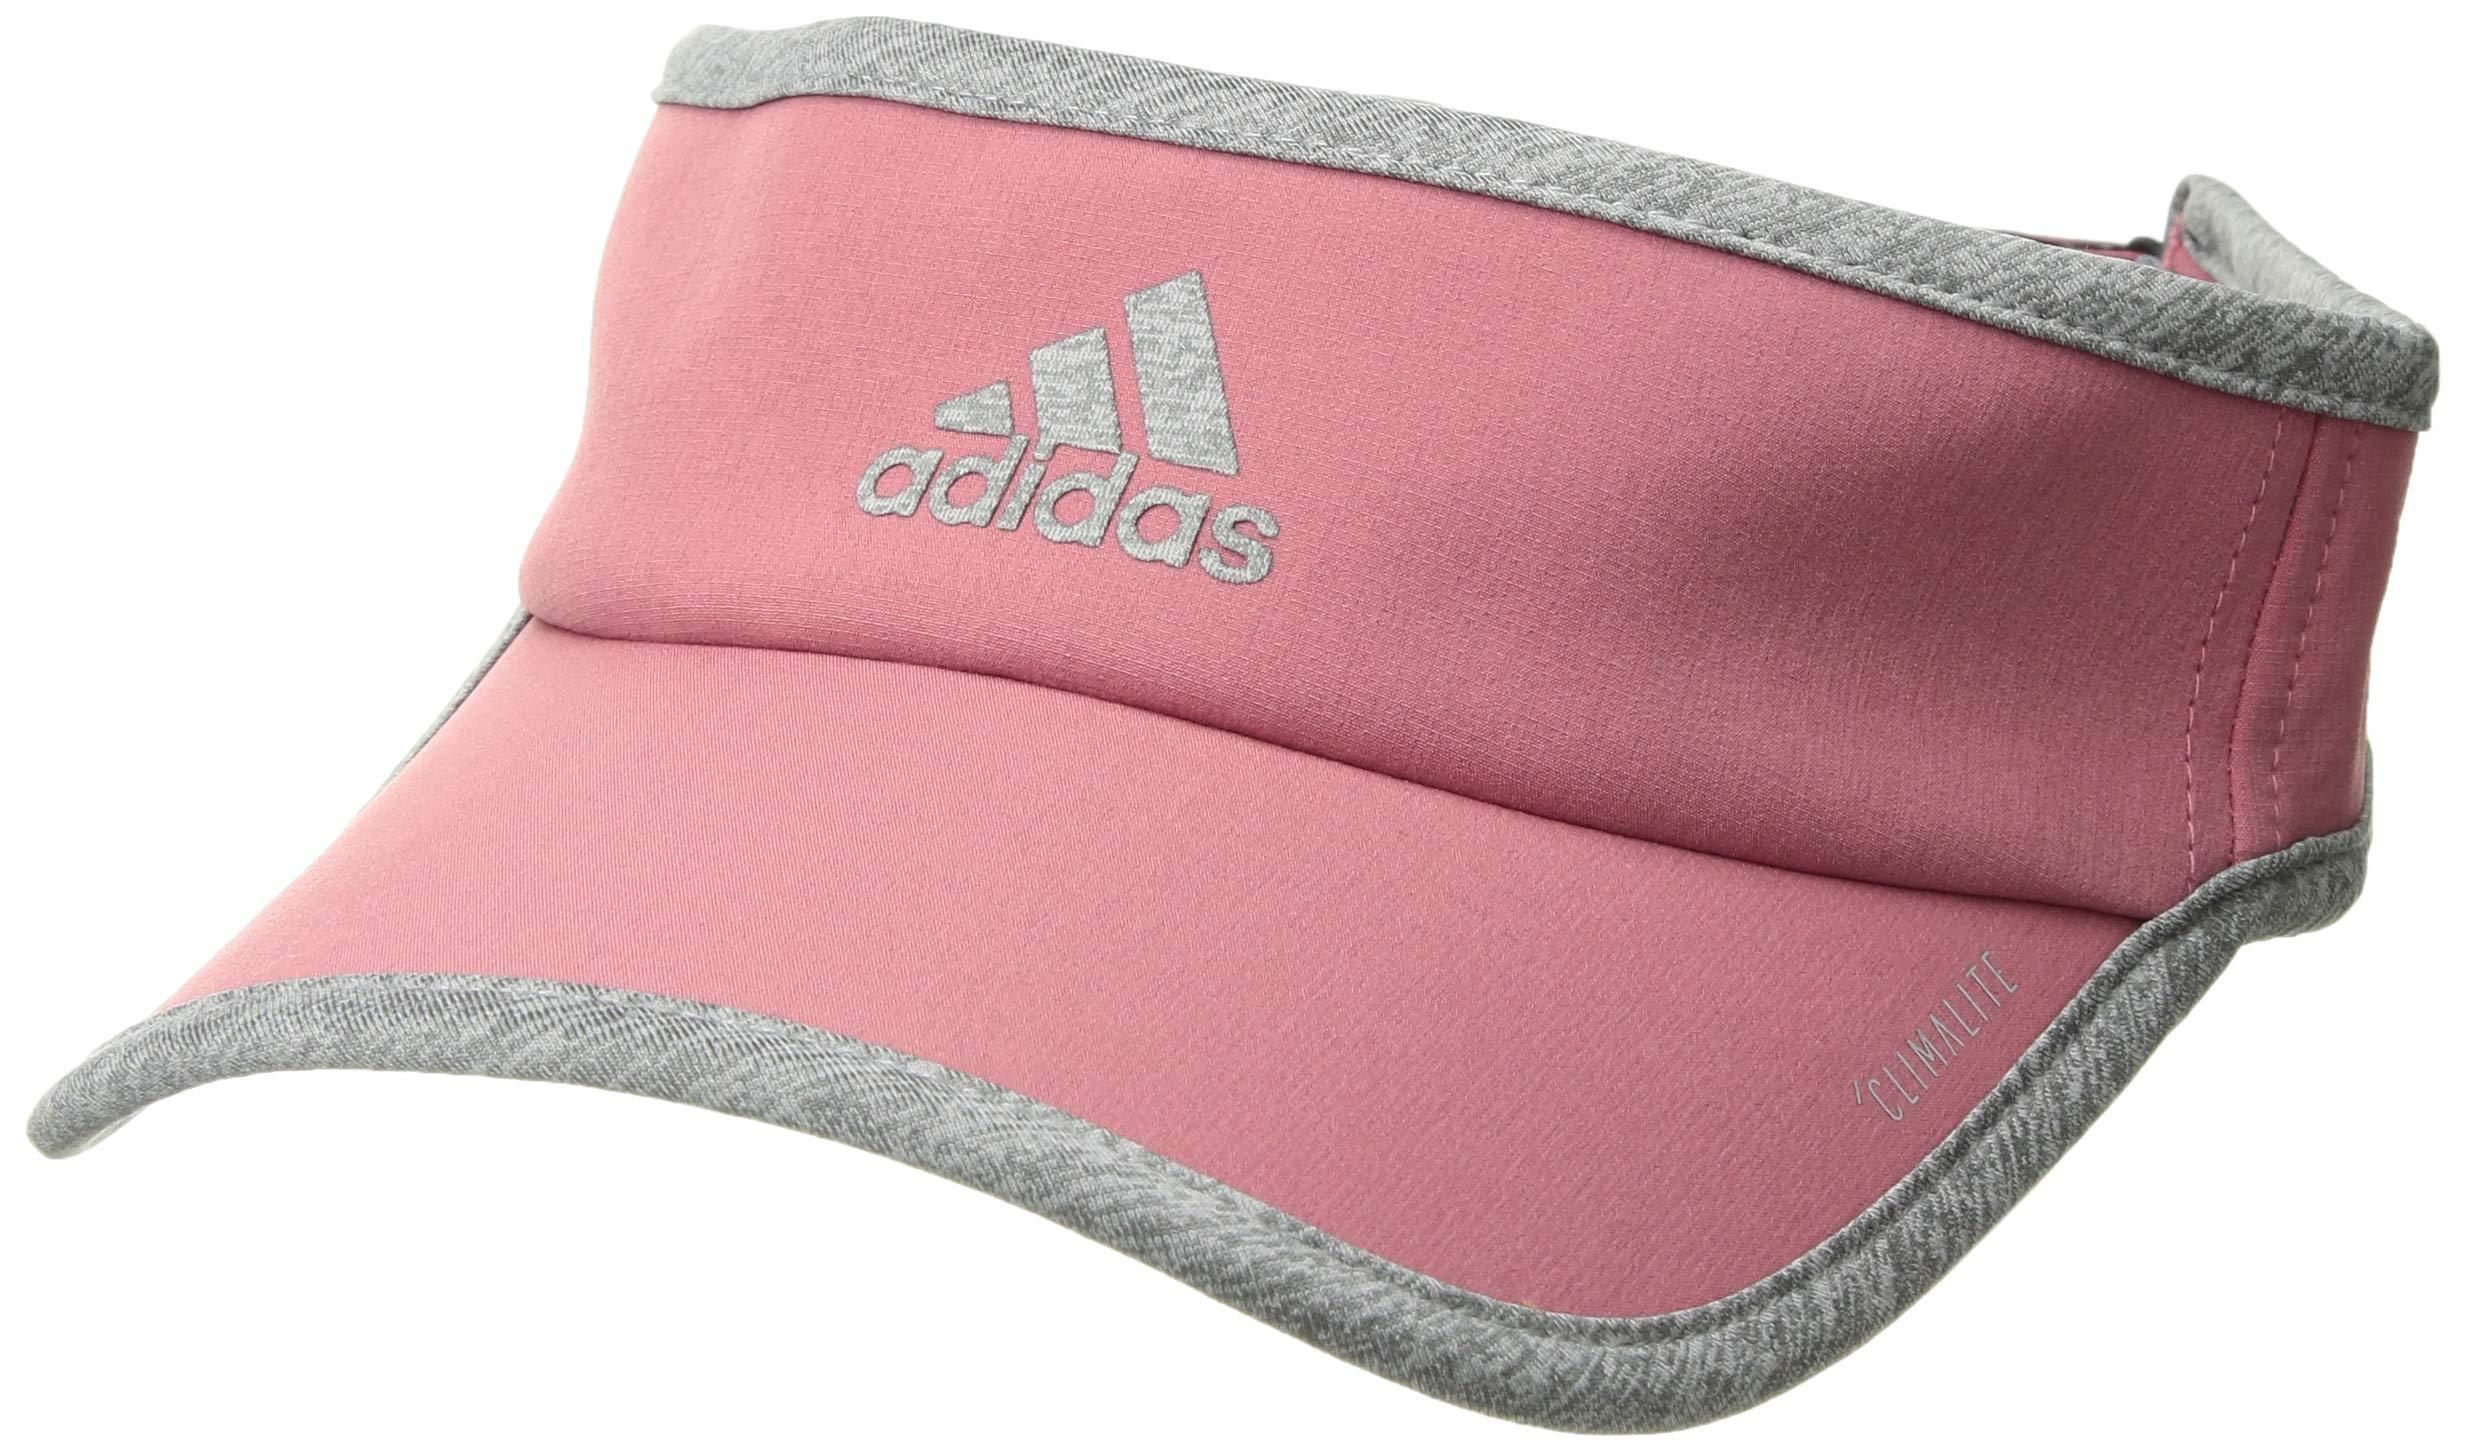 adidas Women's Superlite Visor, trace maroon/light heather grey, One Size